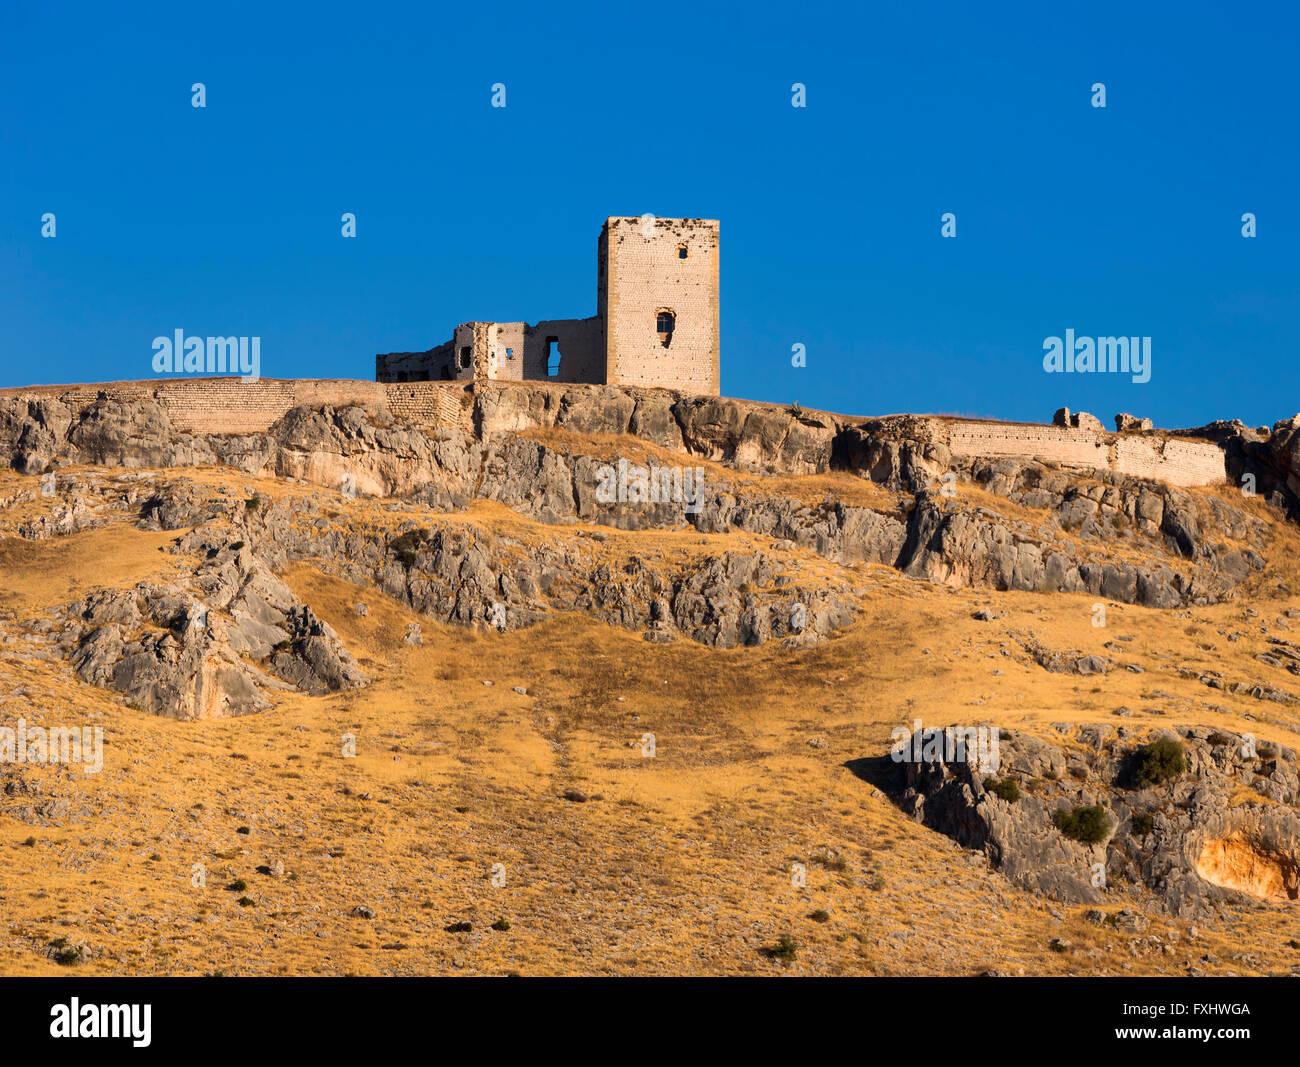 Teba, Provinz Malaga, Andalusien, Südspanien. Burg des Sterns. Castillo De La Estrella Stockbild